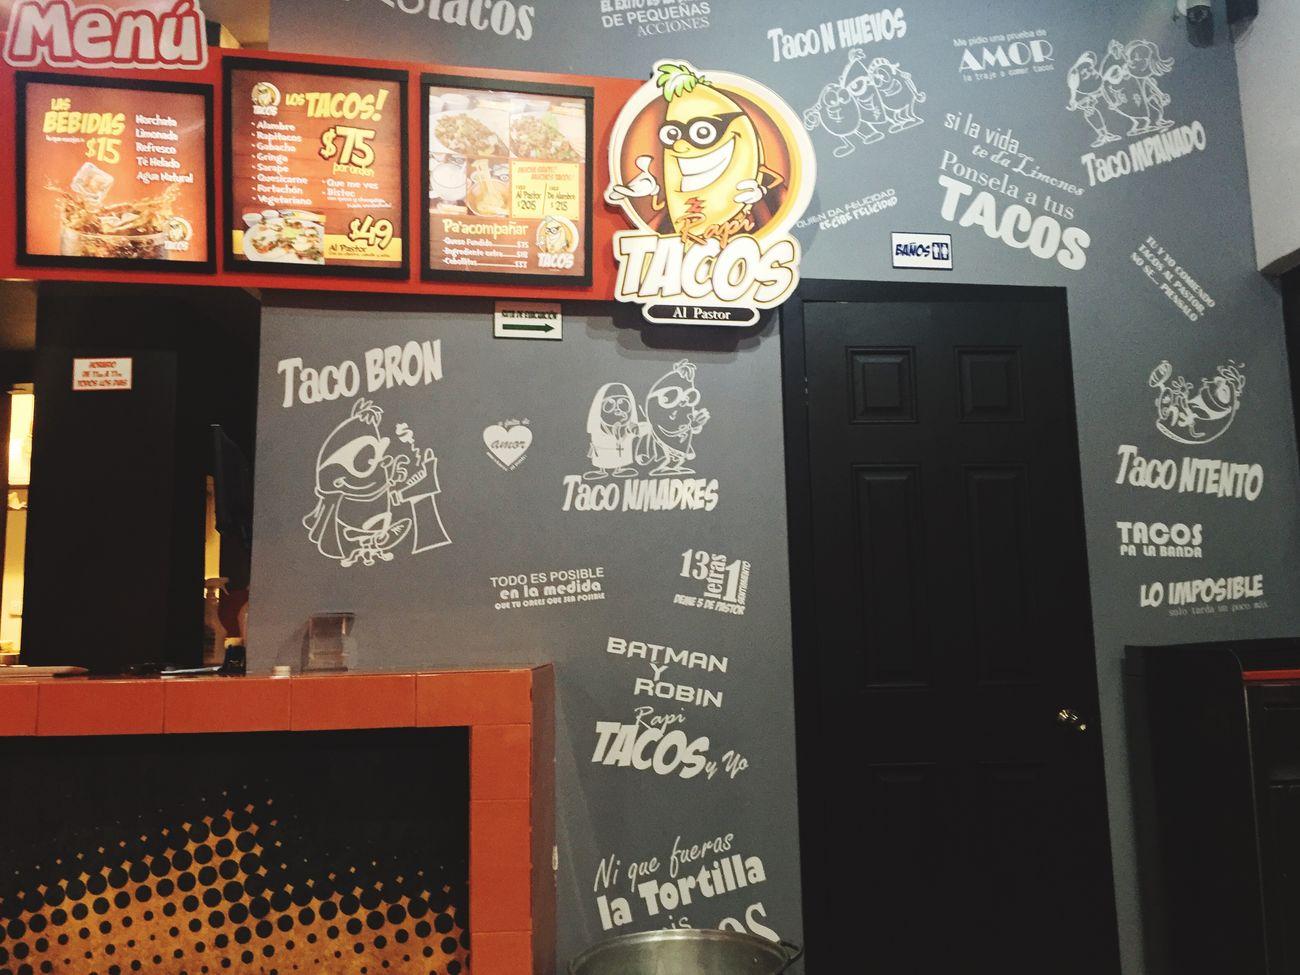 Tacos Al Pastor Mexico Tragadera Time